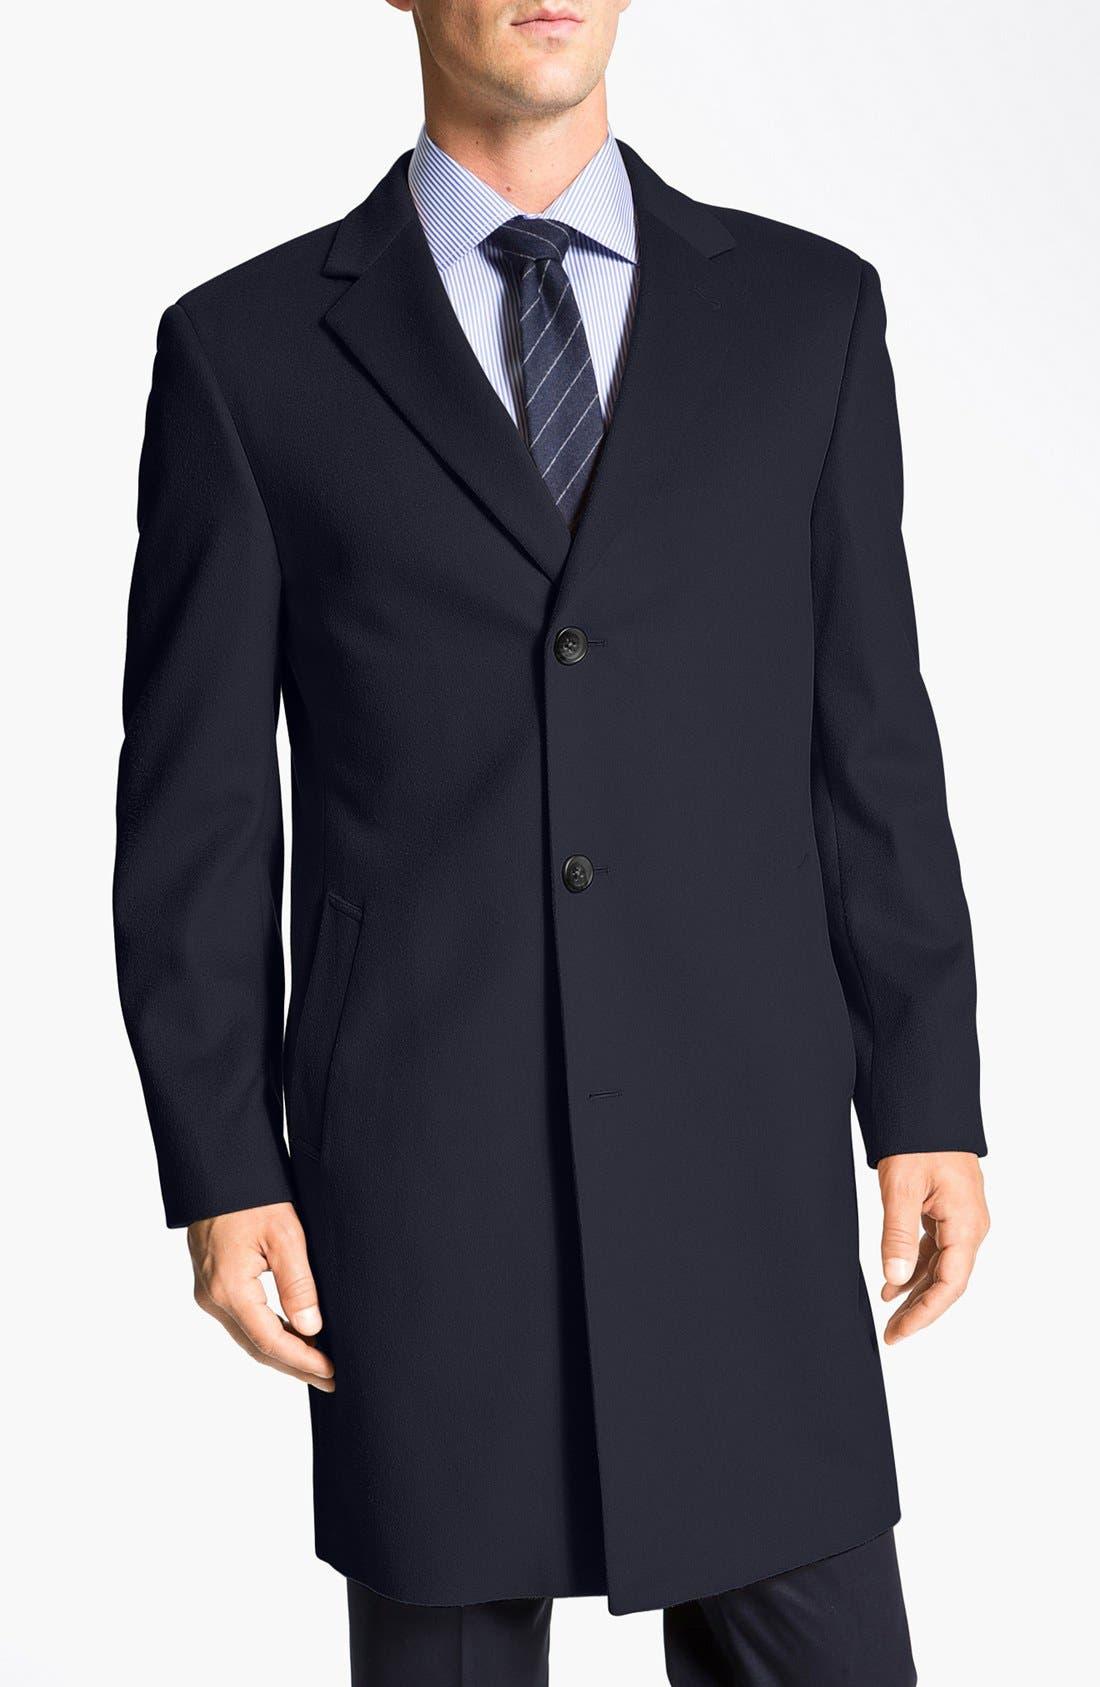 Main Image - John W. Nordstrom® 'Sydney' Top Coat